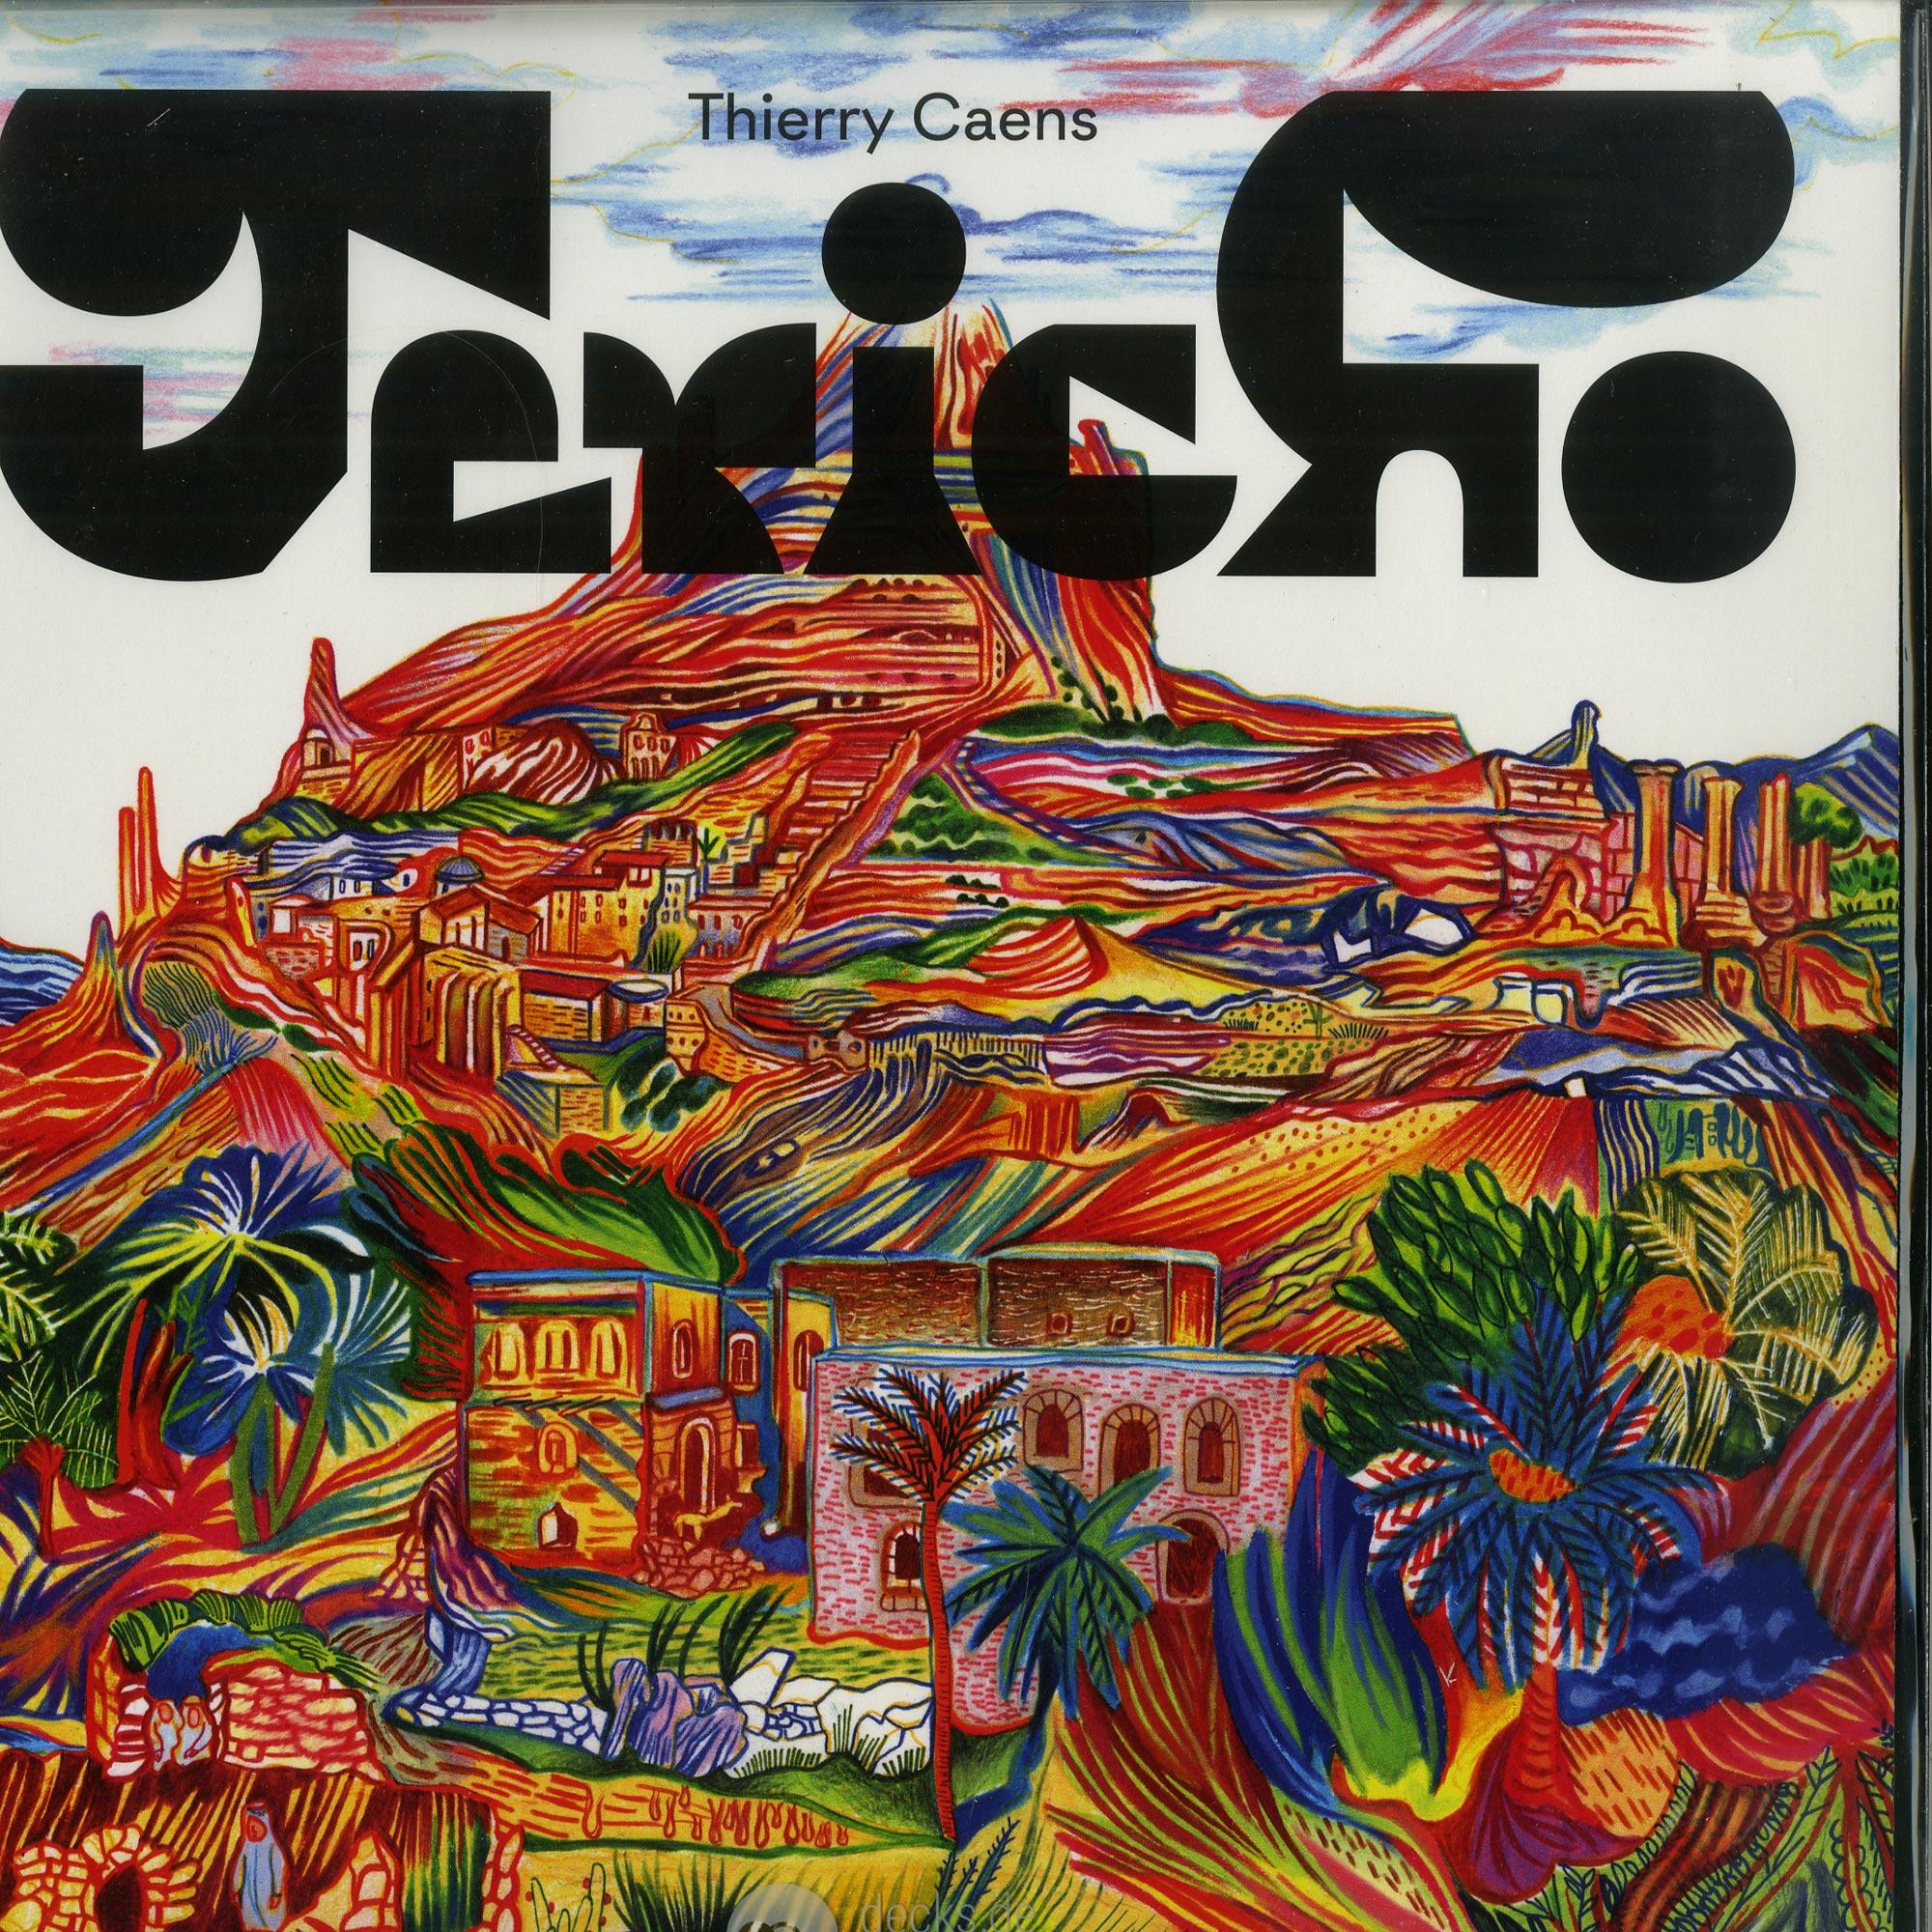 Thierry Caens - JERICHO